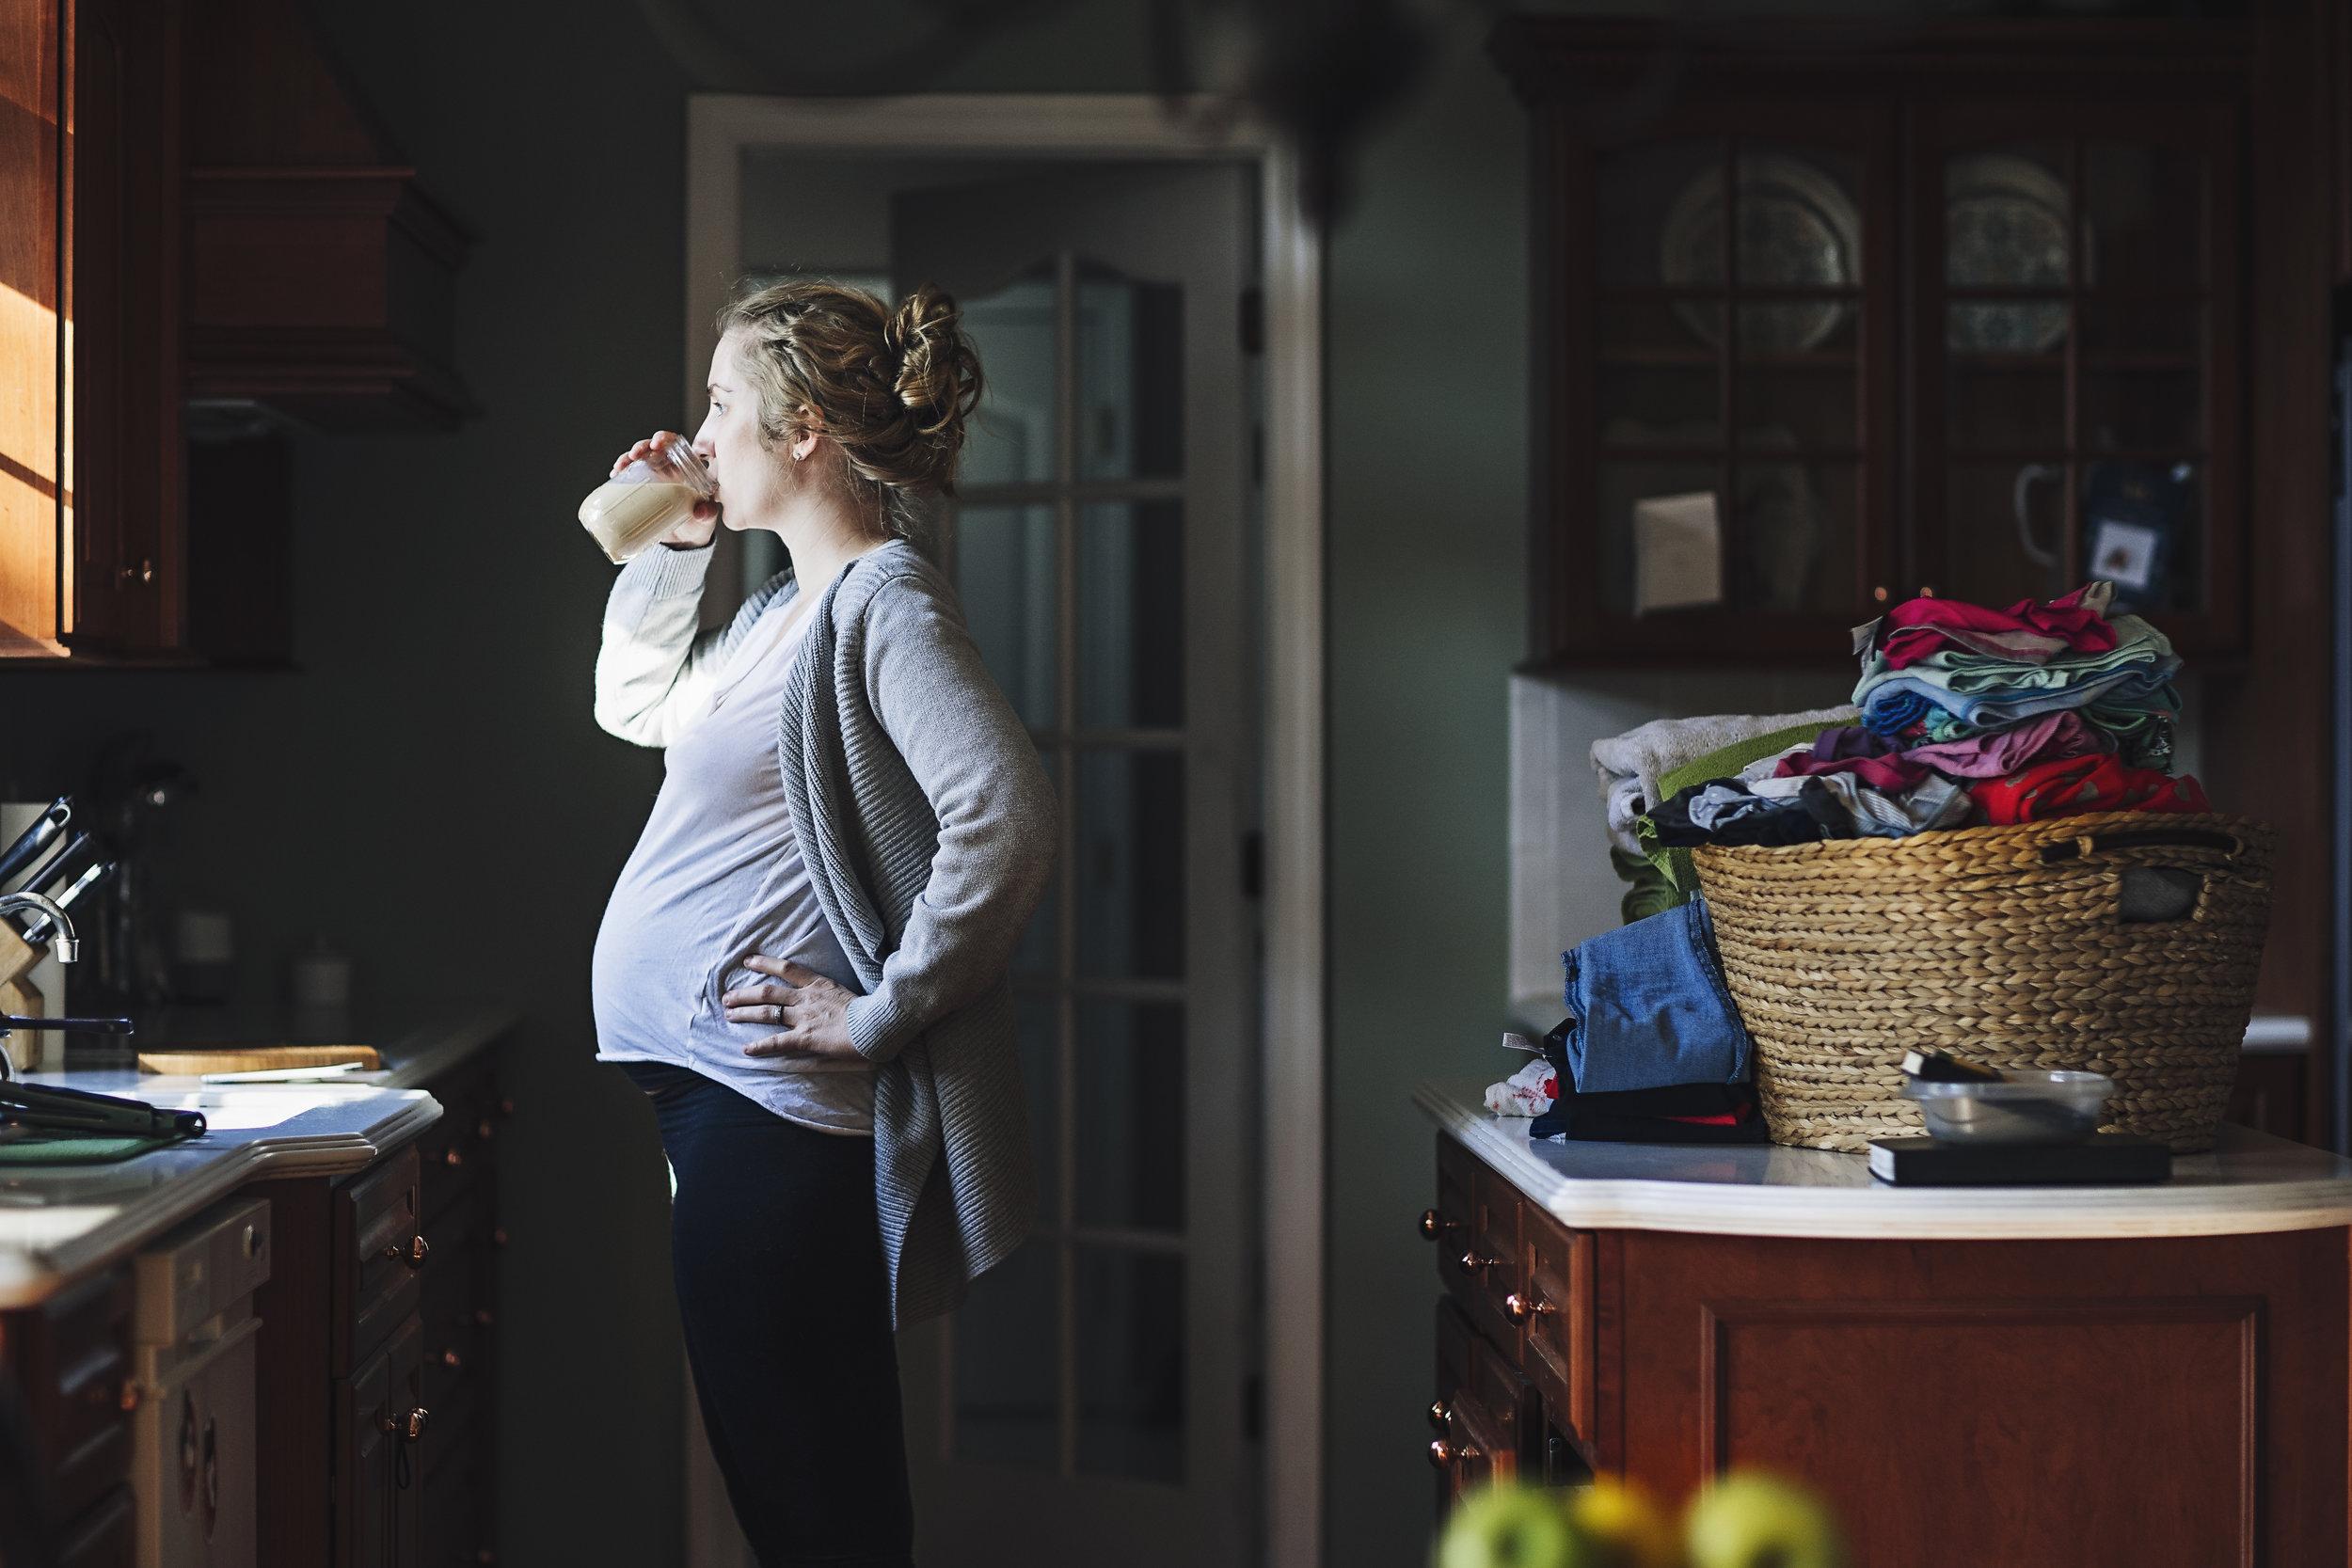 hello-olivia-photography-new-york-photographer-mentor-long-island-ny-laundry-dirty-dishes-tired-mom-drinking-coffee.jpg